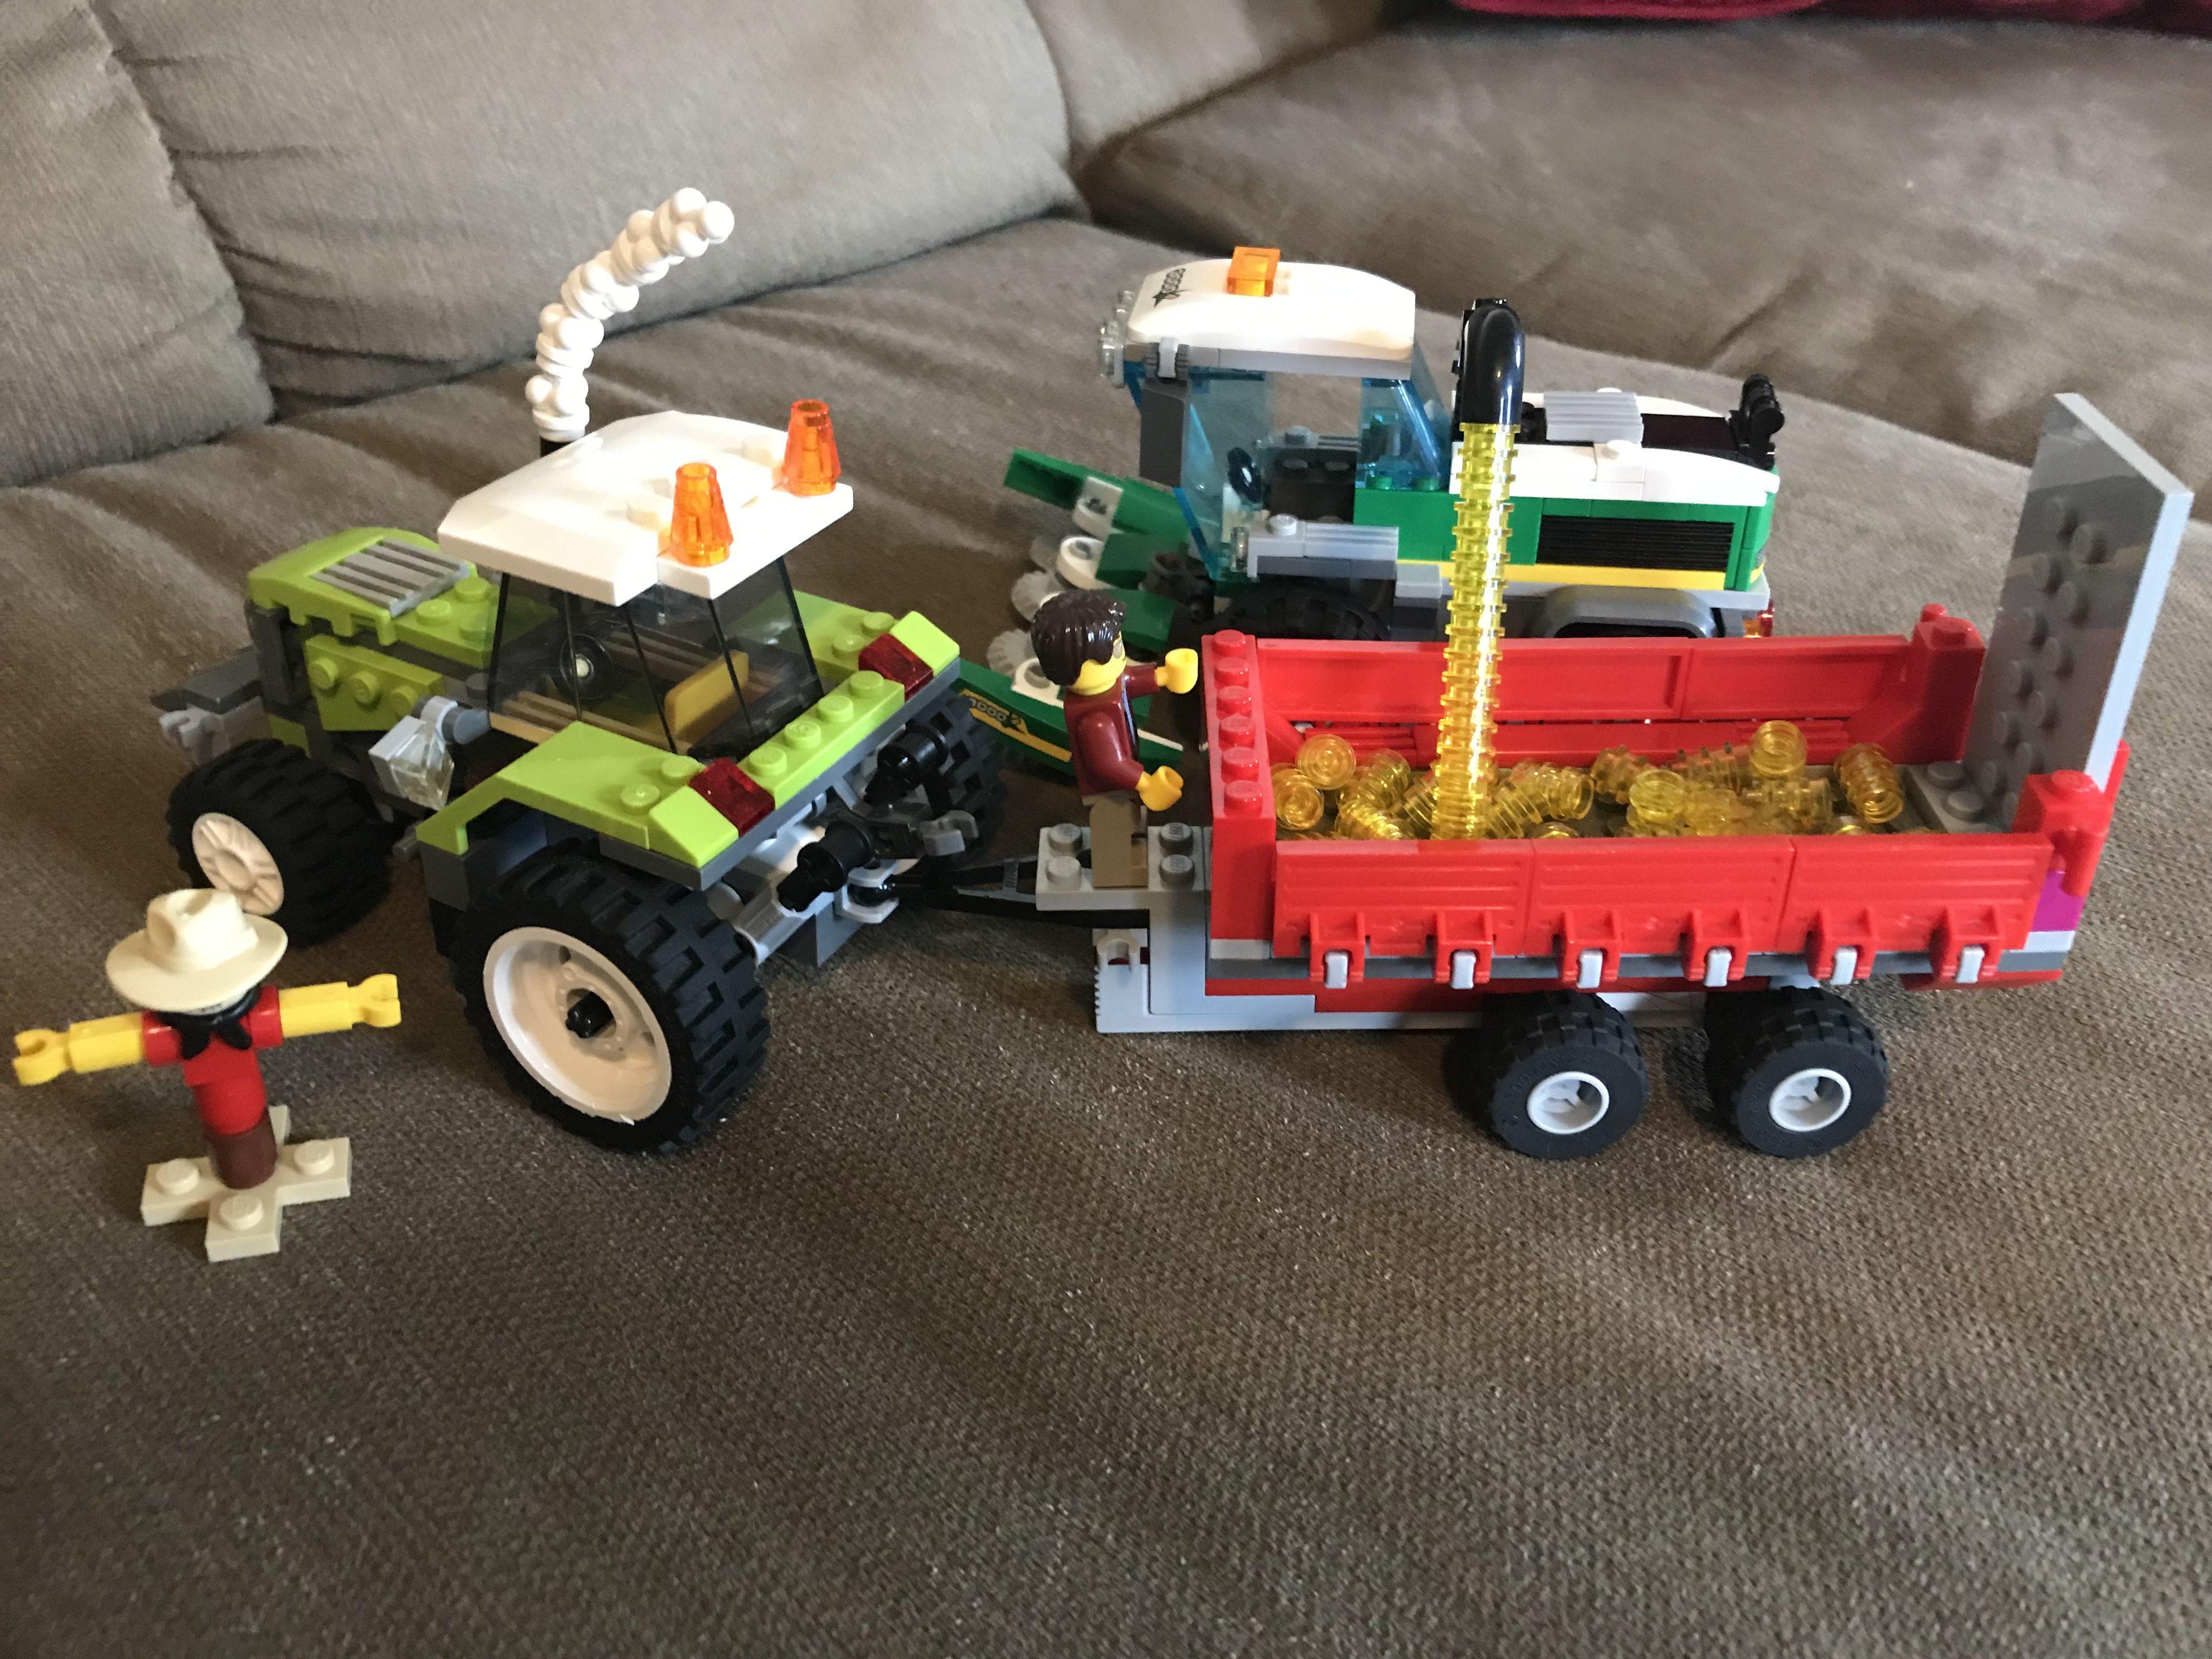 INSTRUCTIONS for Custom Lego Combine Harvester I Town City Farm Tractor Model